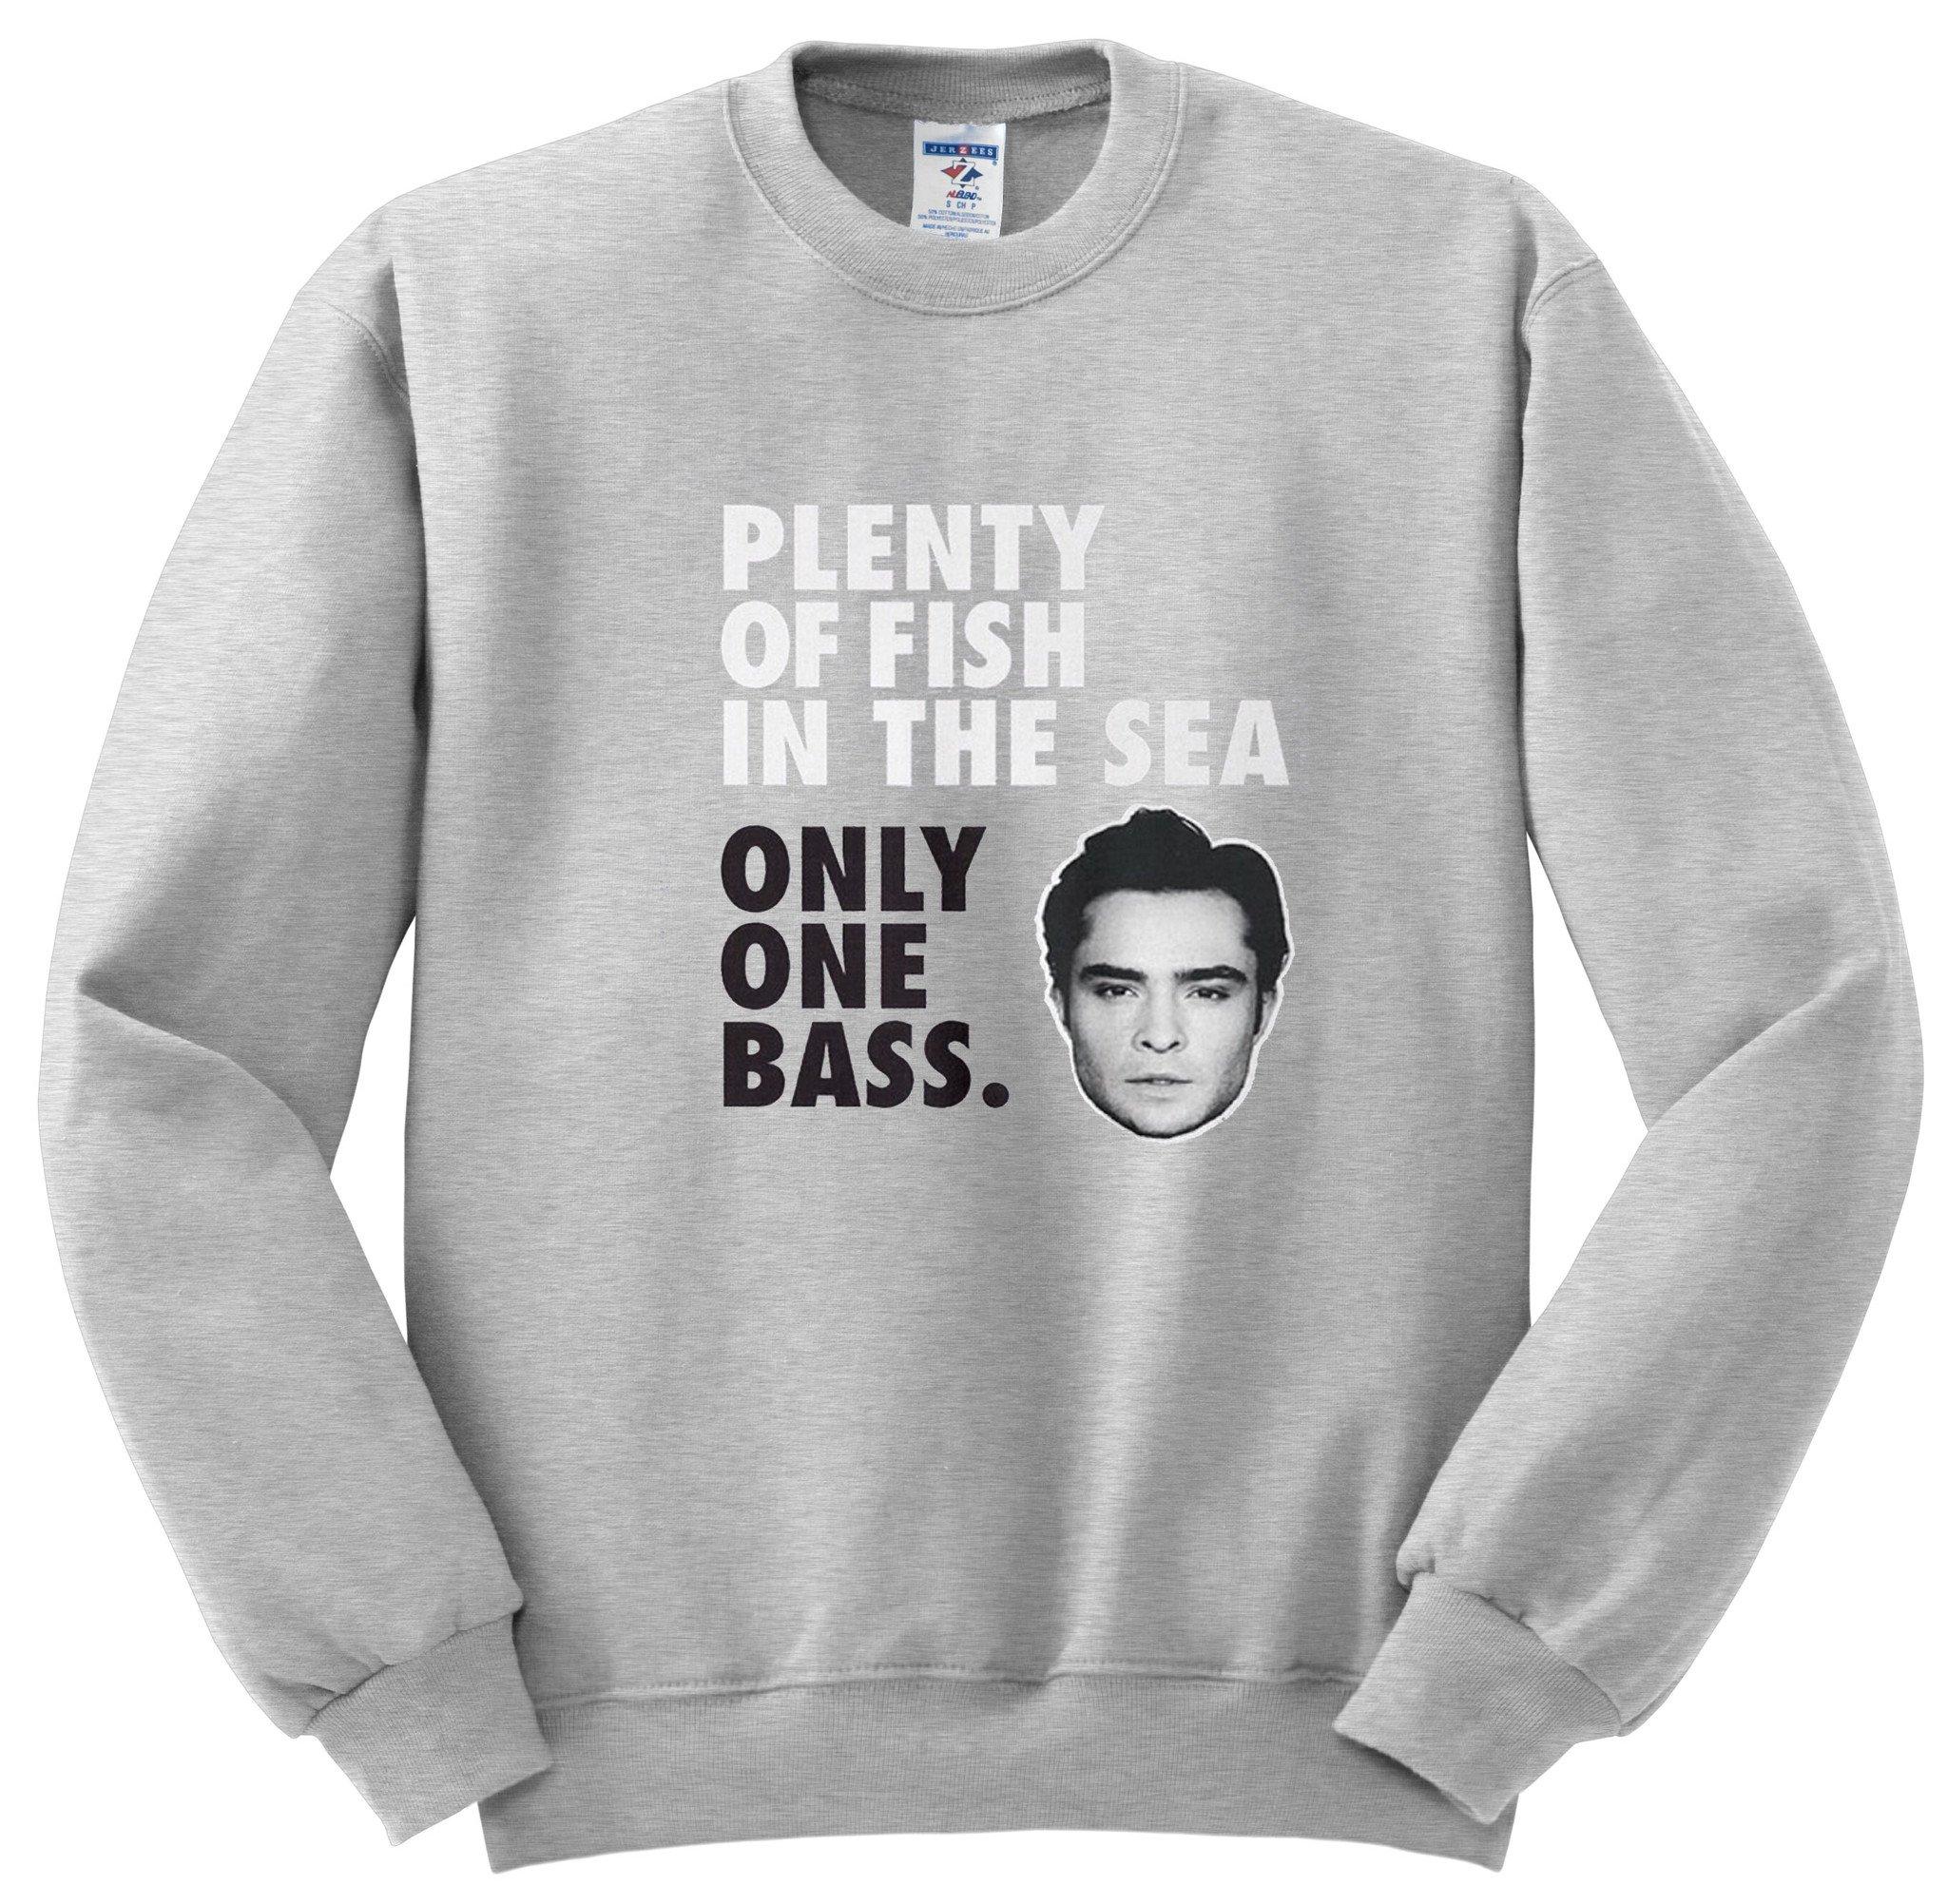 Only one bass sweatshirt